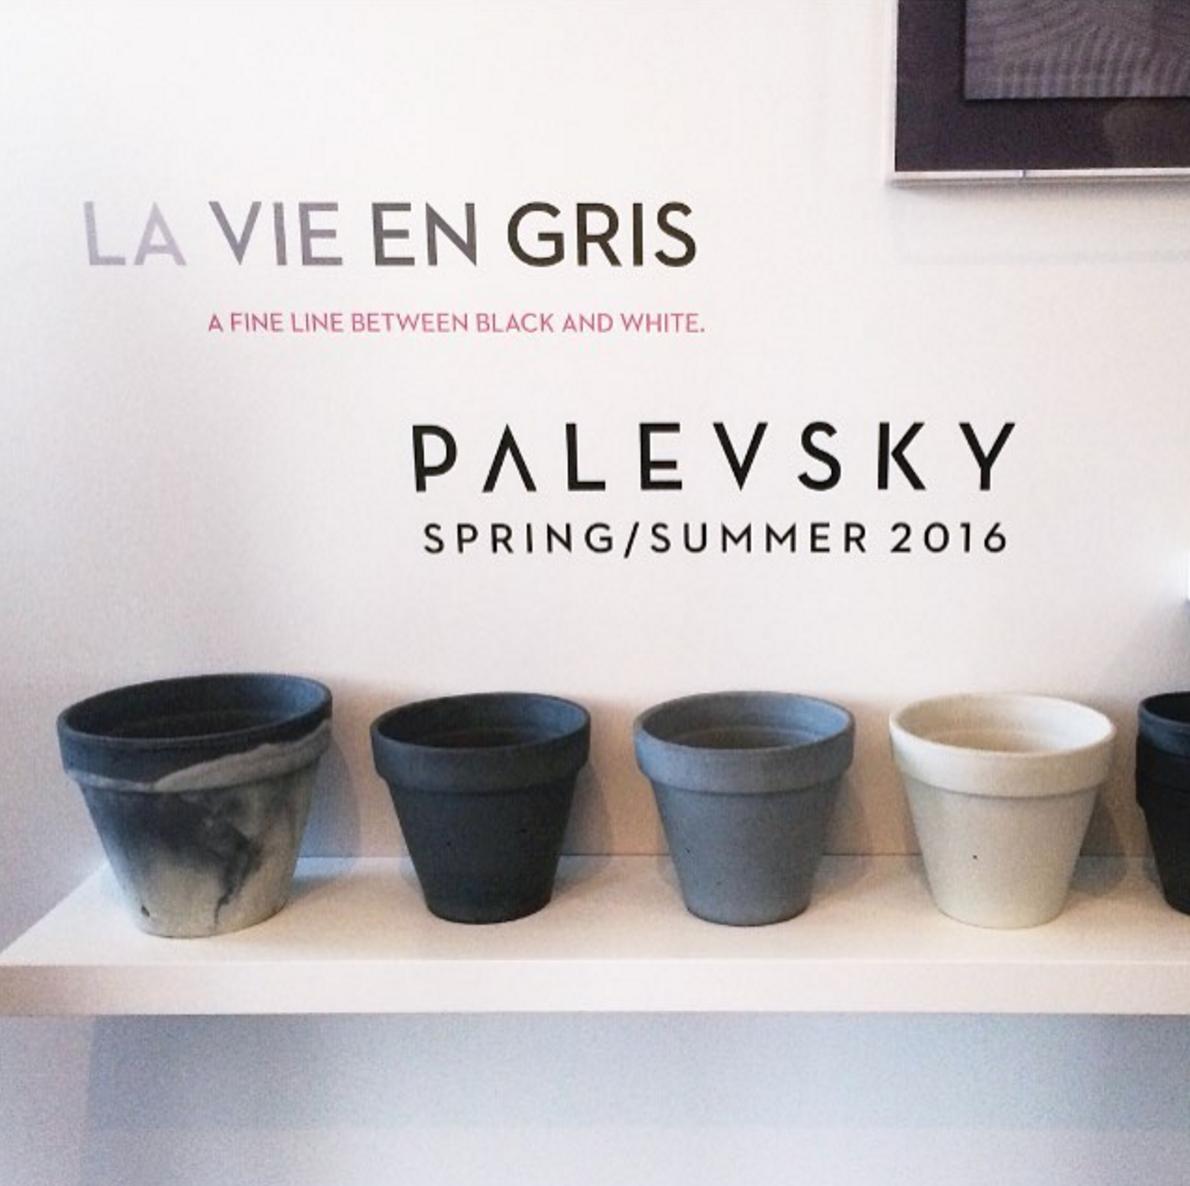 Palevsky    La Vie En Gris   Design Showcase  Brentwood, CA  May 7, 2016